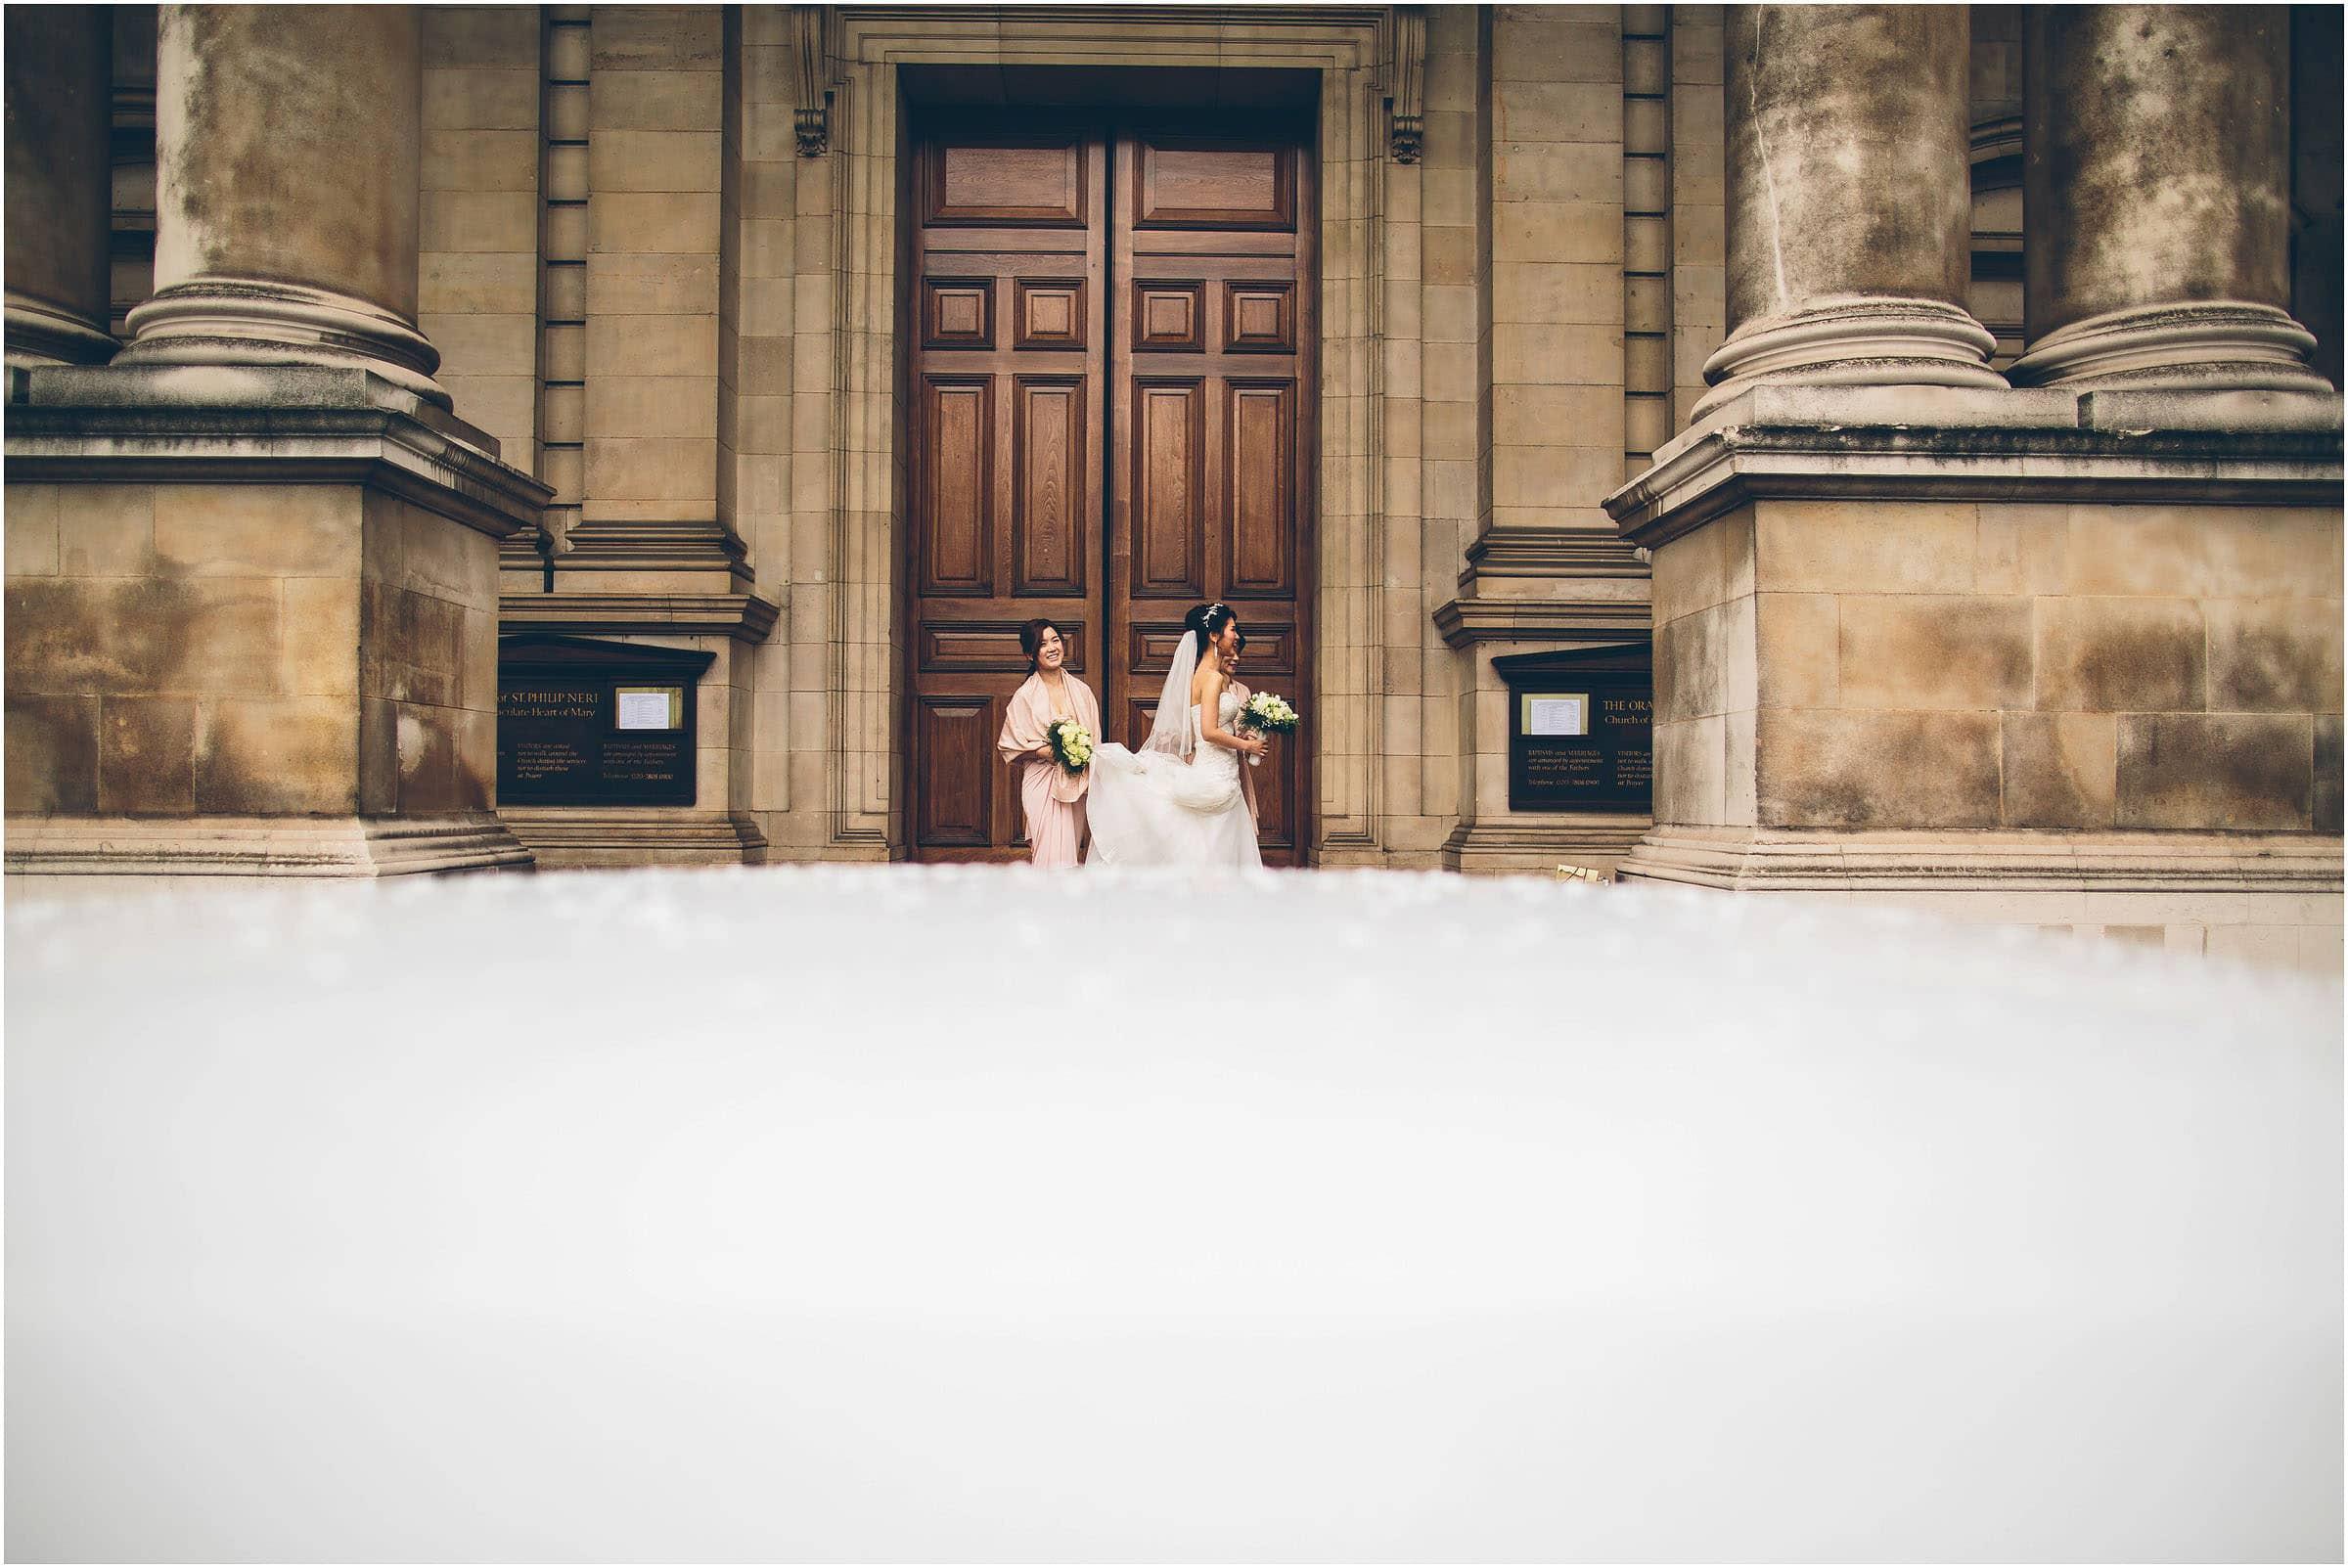 Royal_Horseguards_Wedding_Photography_0029